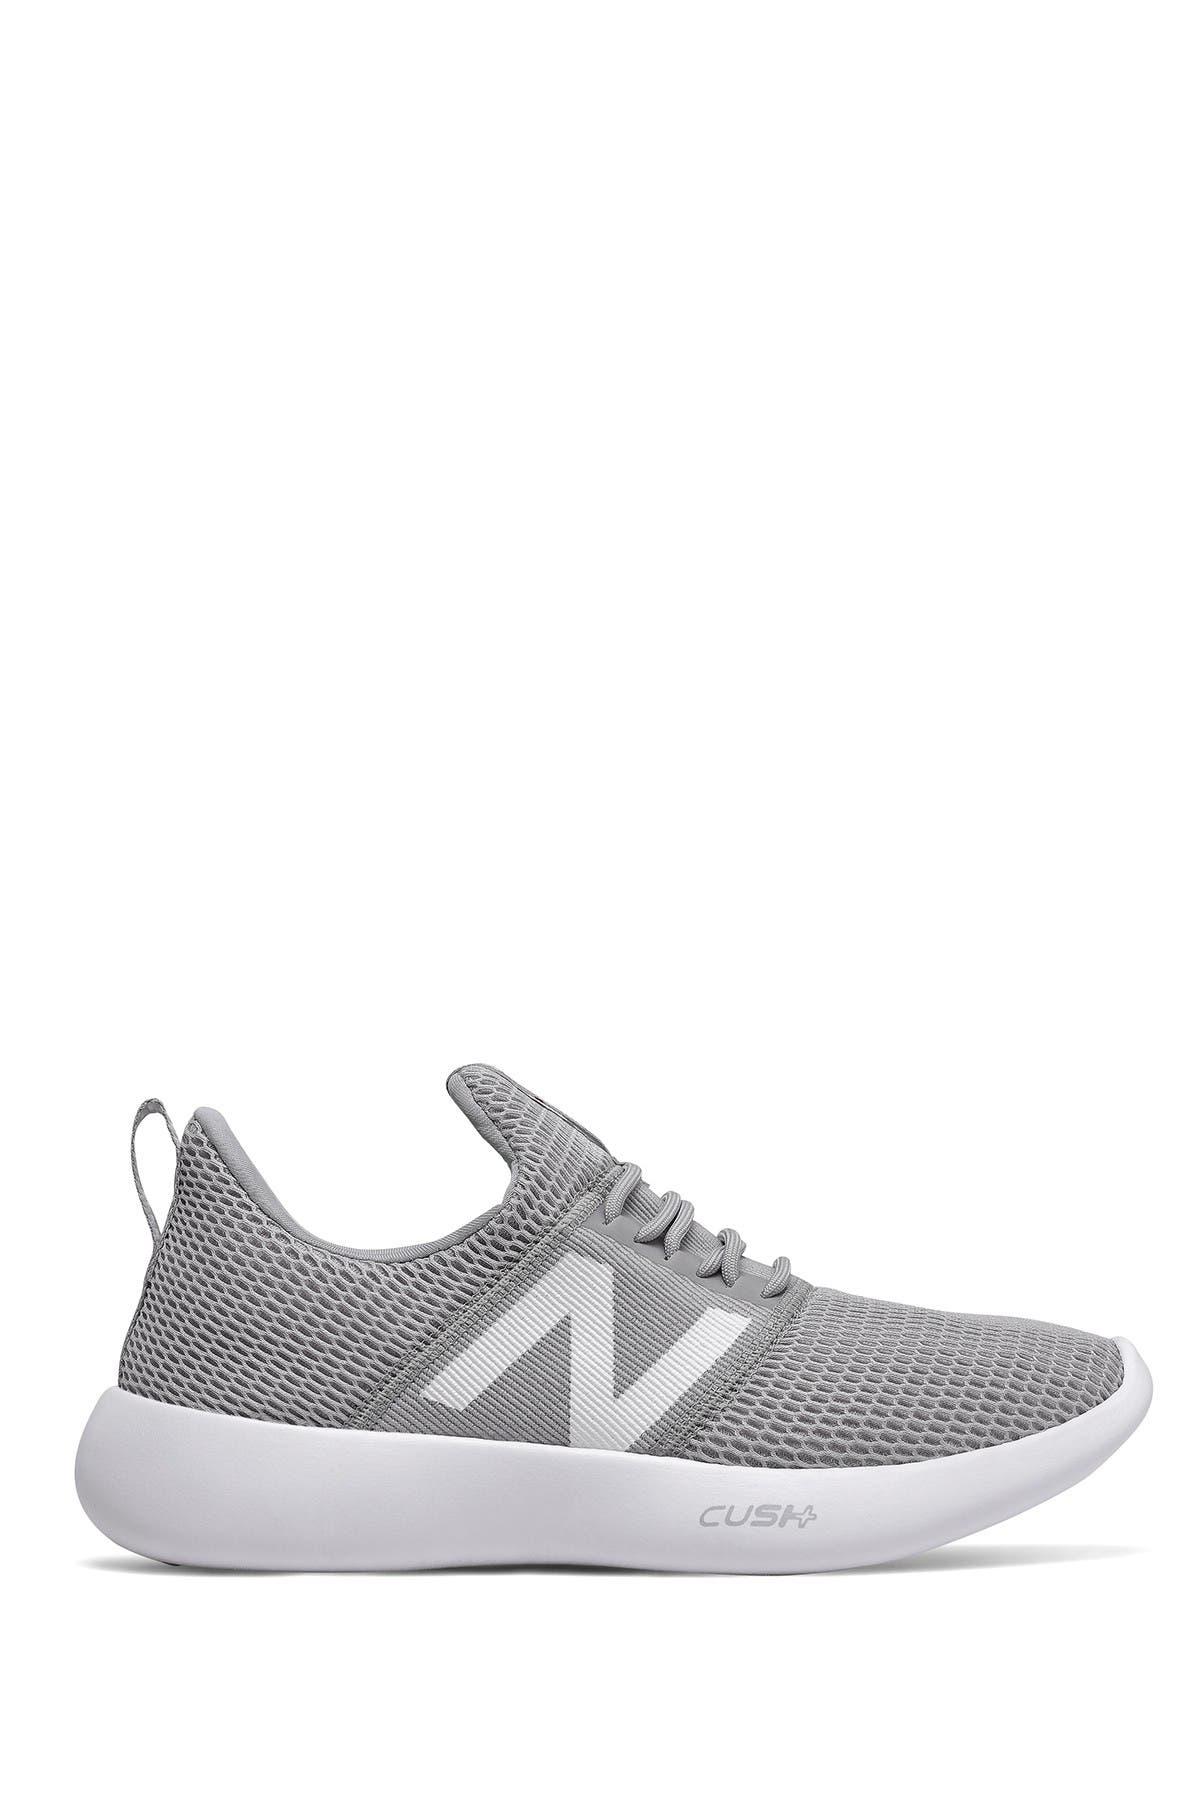 New Balance | Recovery Running Shoe